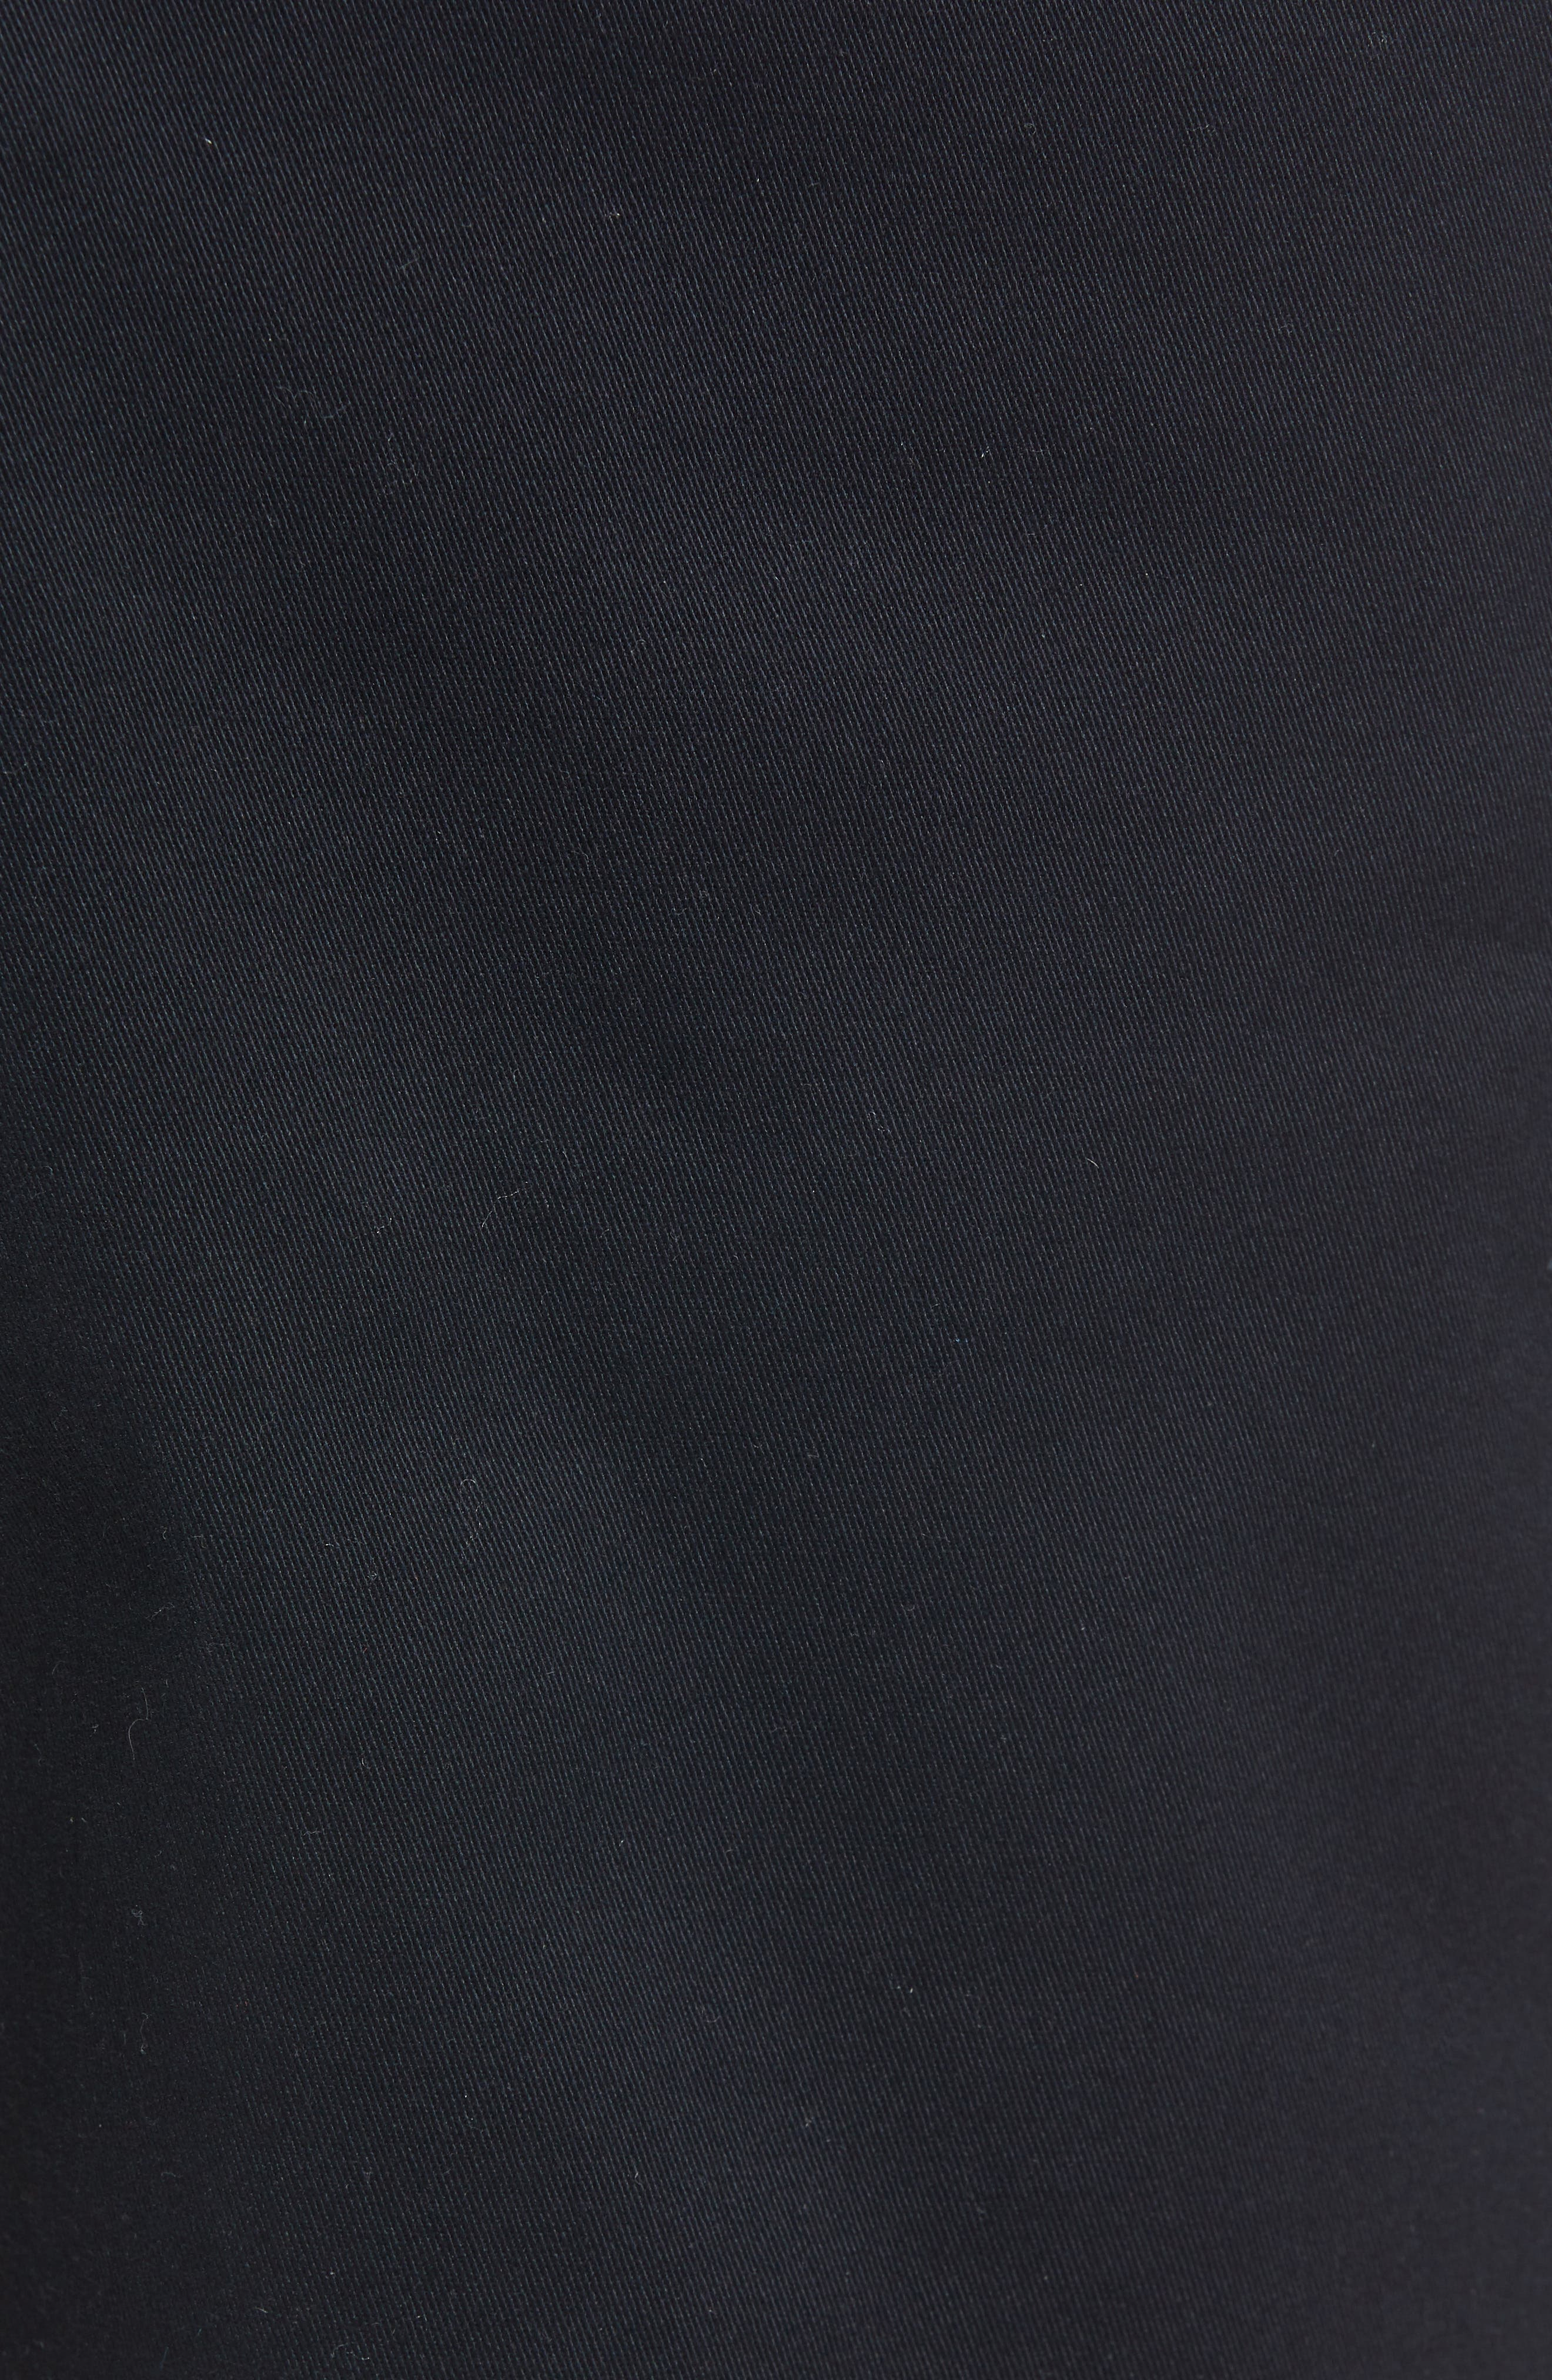 Flat Front Shorts,                             Alternate thumbnail 5, color,                             001